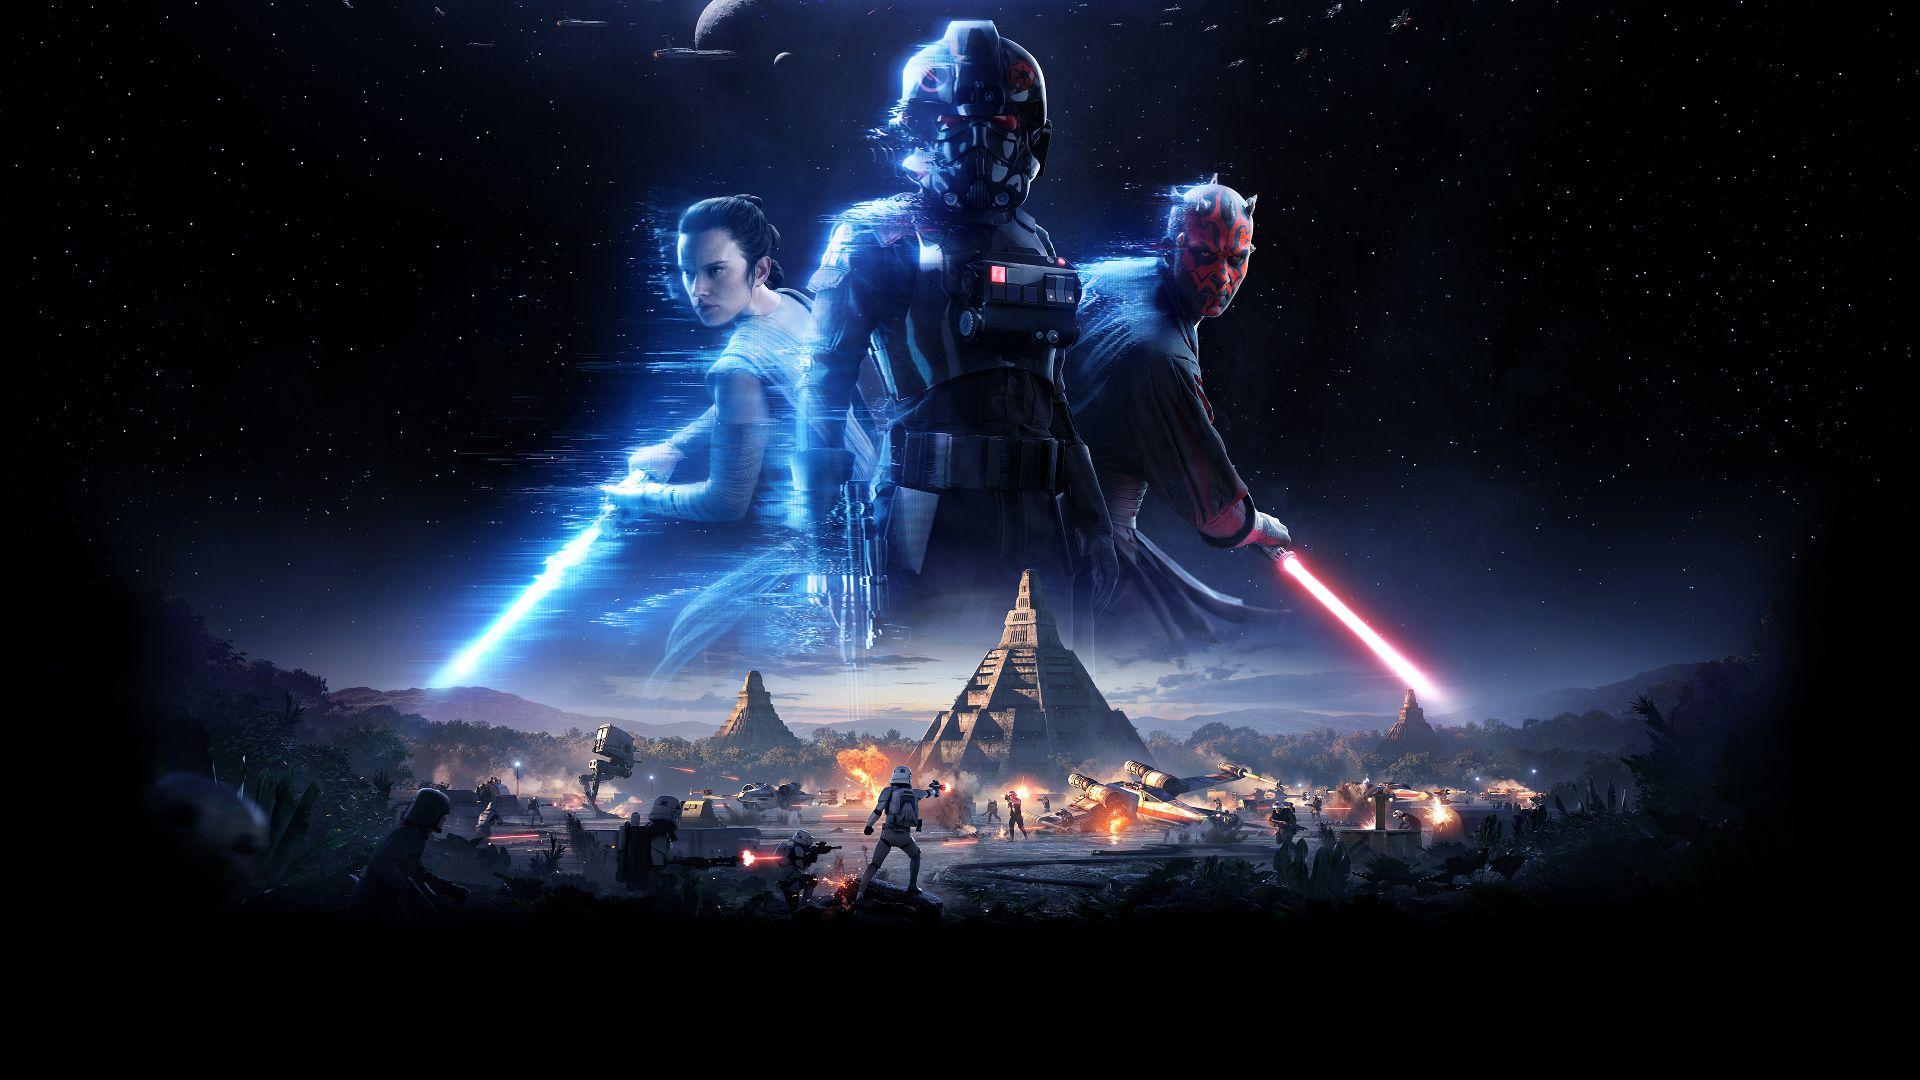 Star Wars Battlefront 2 Latest Gameplay Video Showcases ...